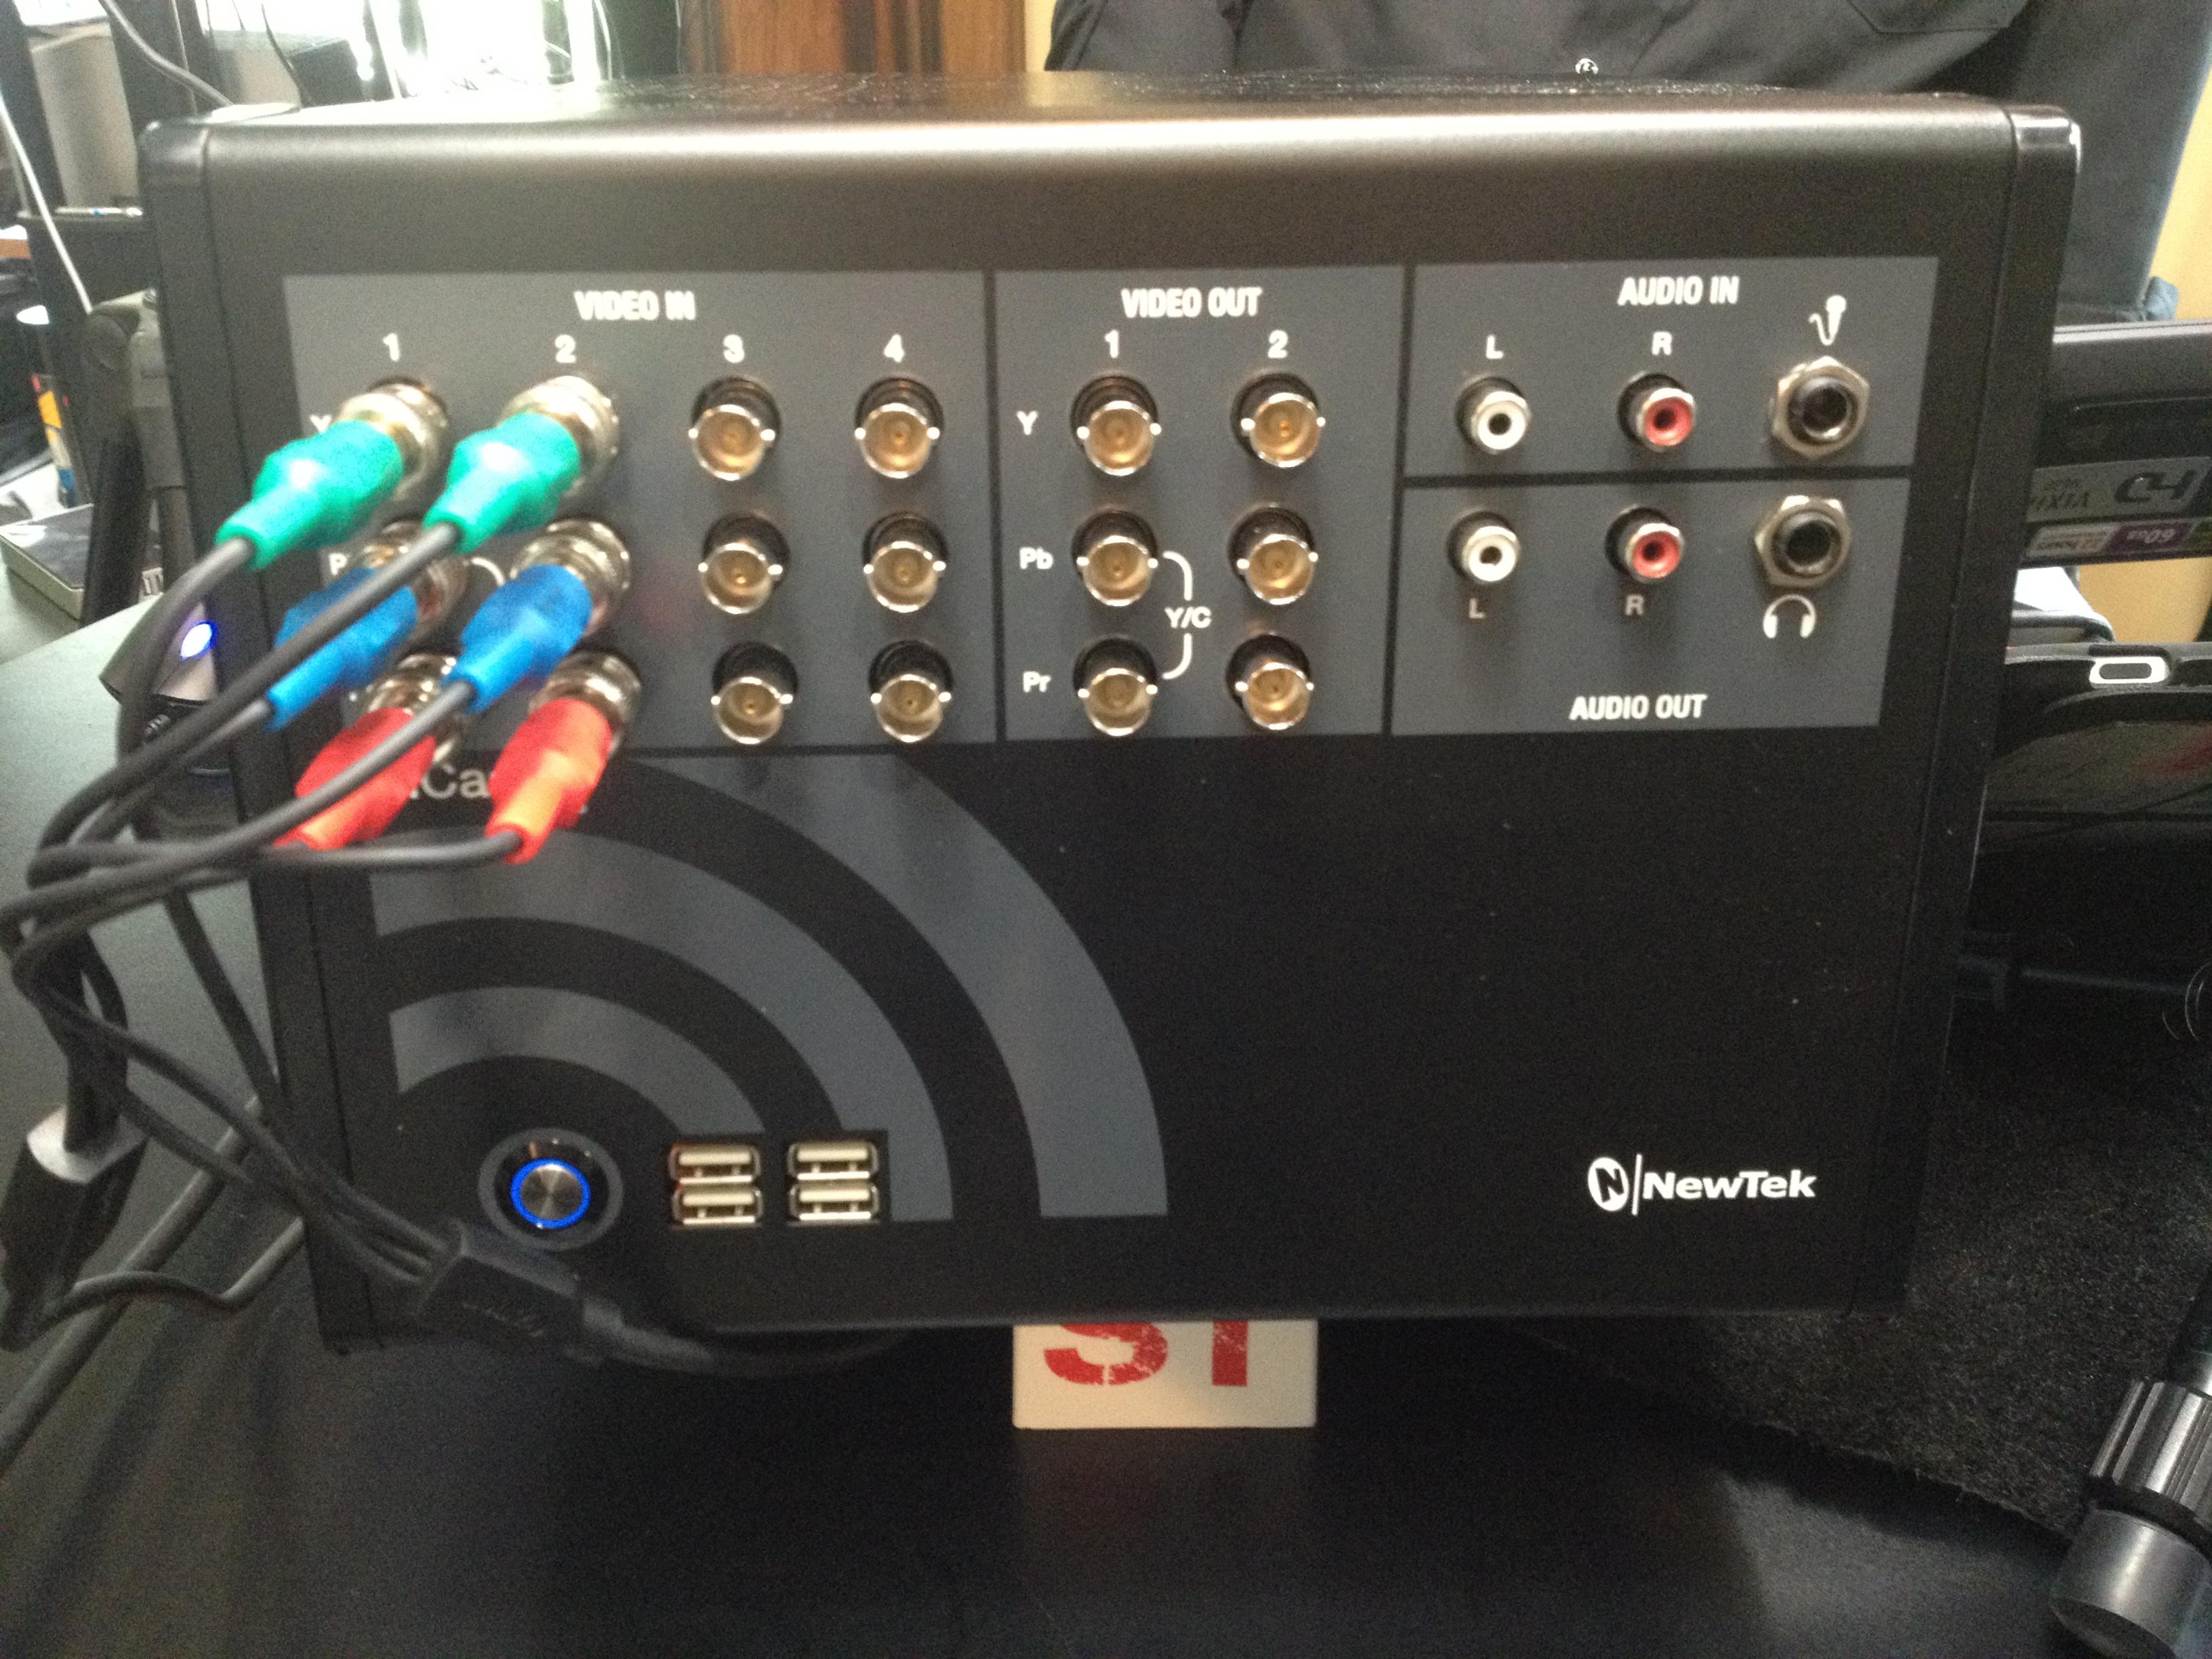 NewTek TriCaster TC40 Front Panel Image